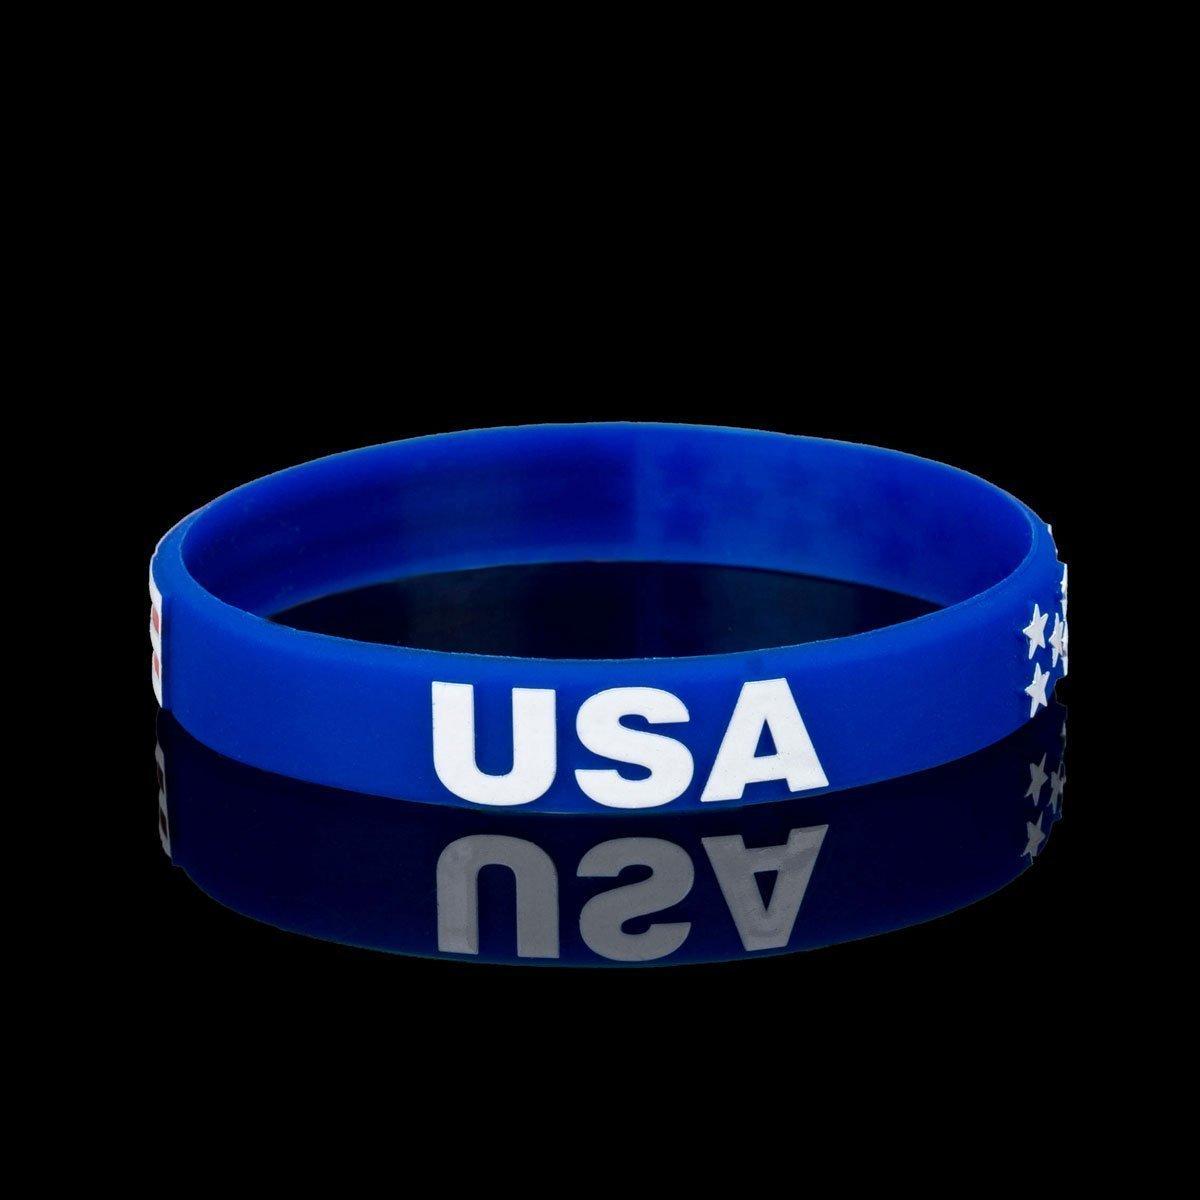 db7ce495db89 American Flag Silicone Wristbands